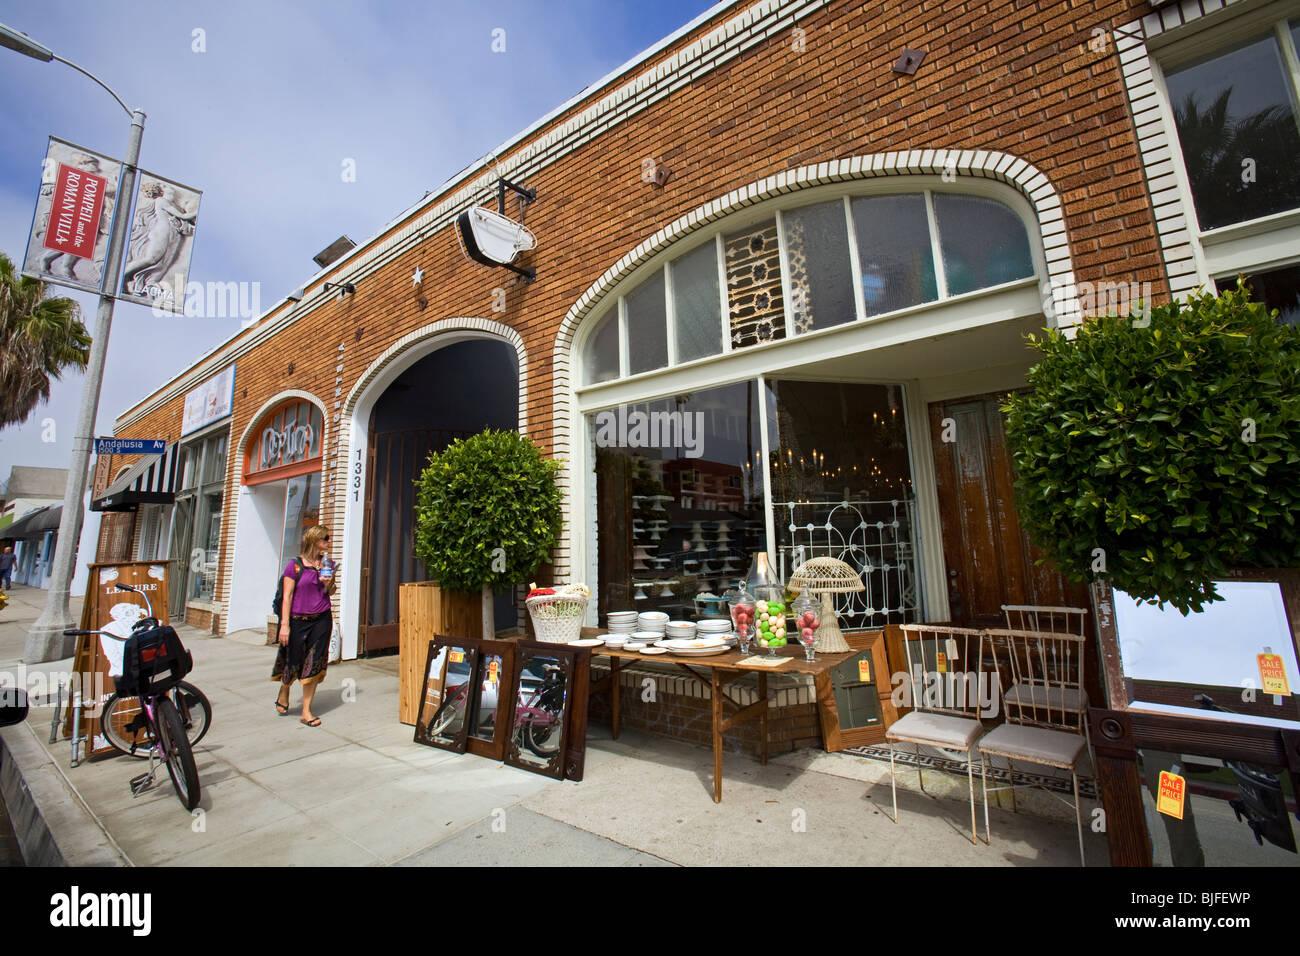 antique stores los angeles Antique Store, Abbot Kinney Blvd, Venice Beach, Los Angeles Stock  antique stores los angeles